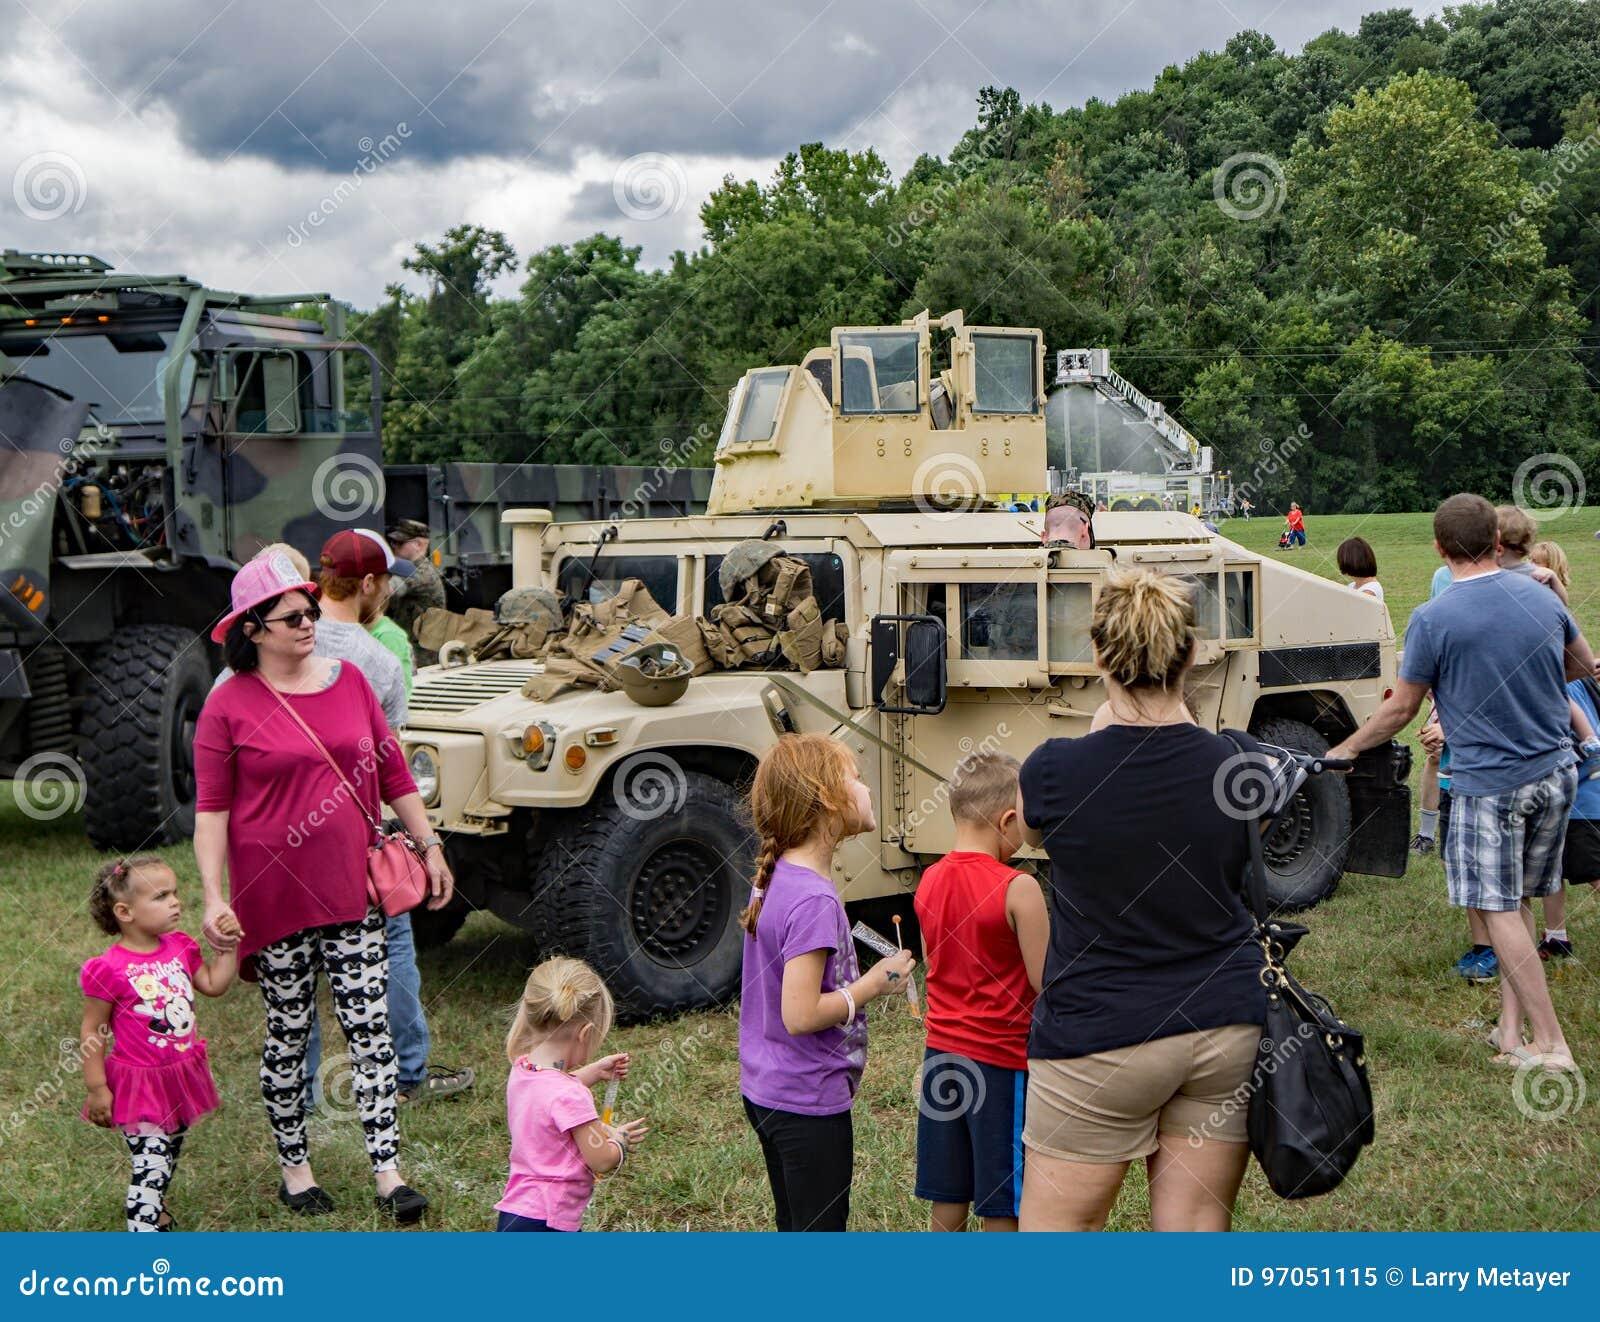 Families Enjoying the Military Hardware